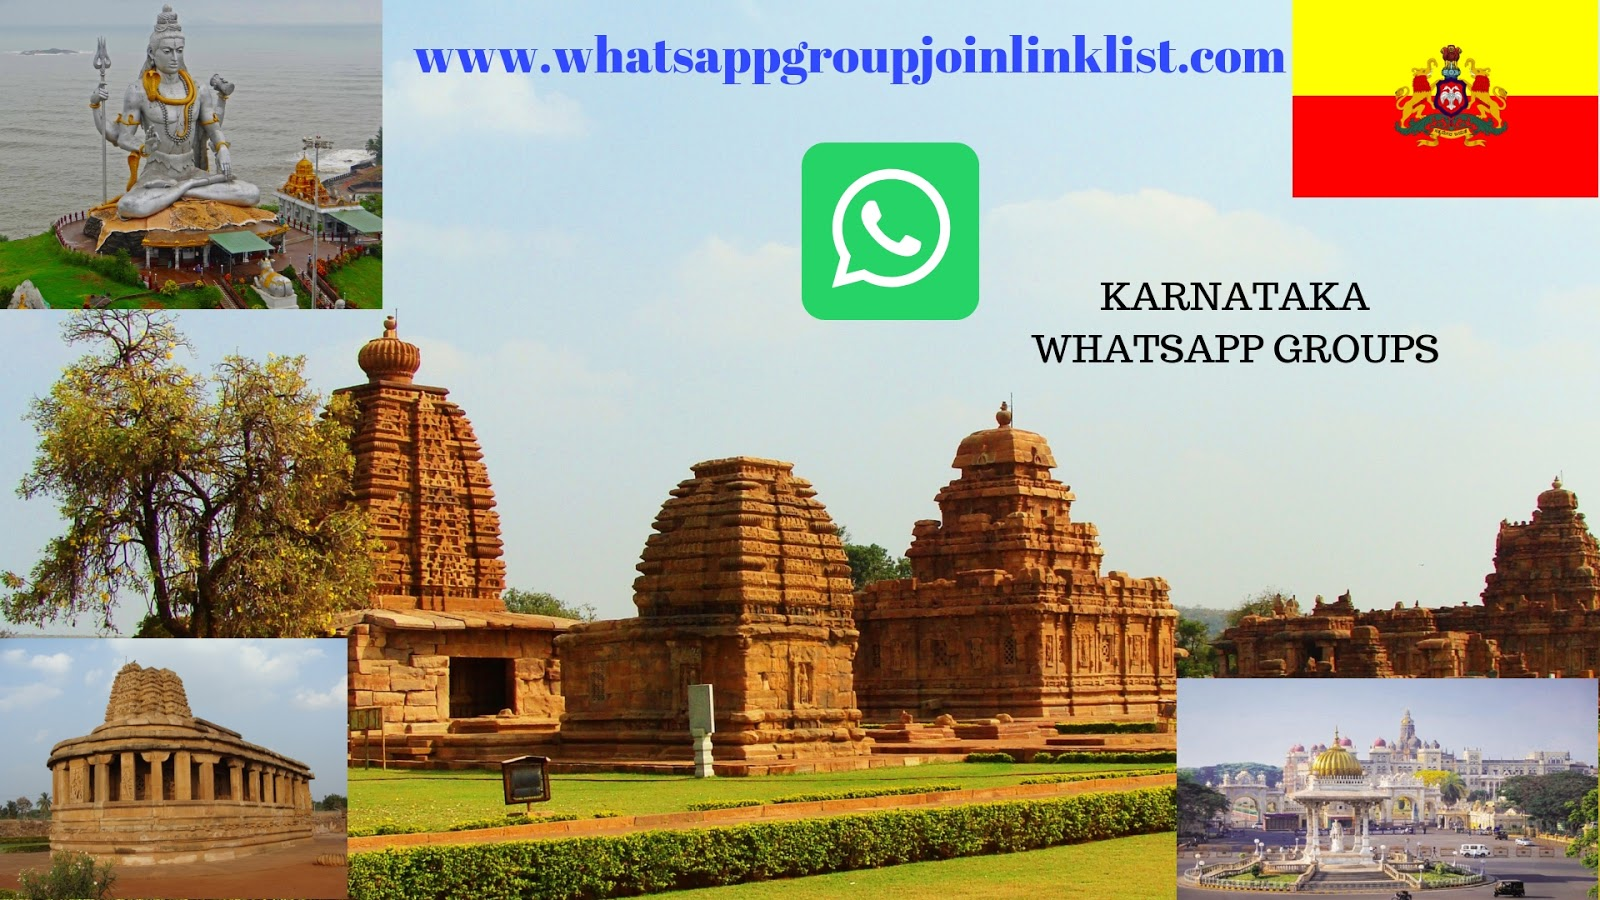 Karnataka WhatsApp Group Join Link List[Kannada WhatsApp Groups]